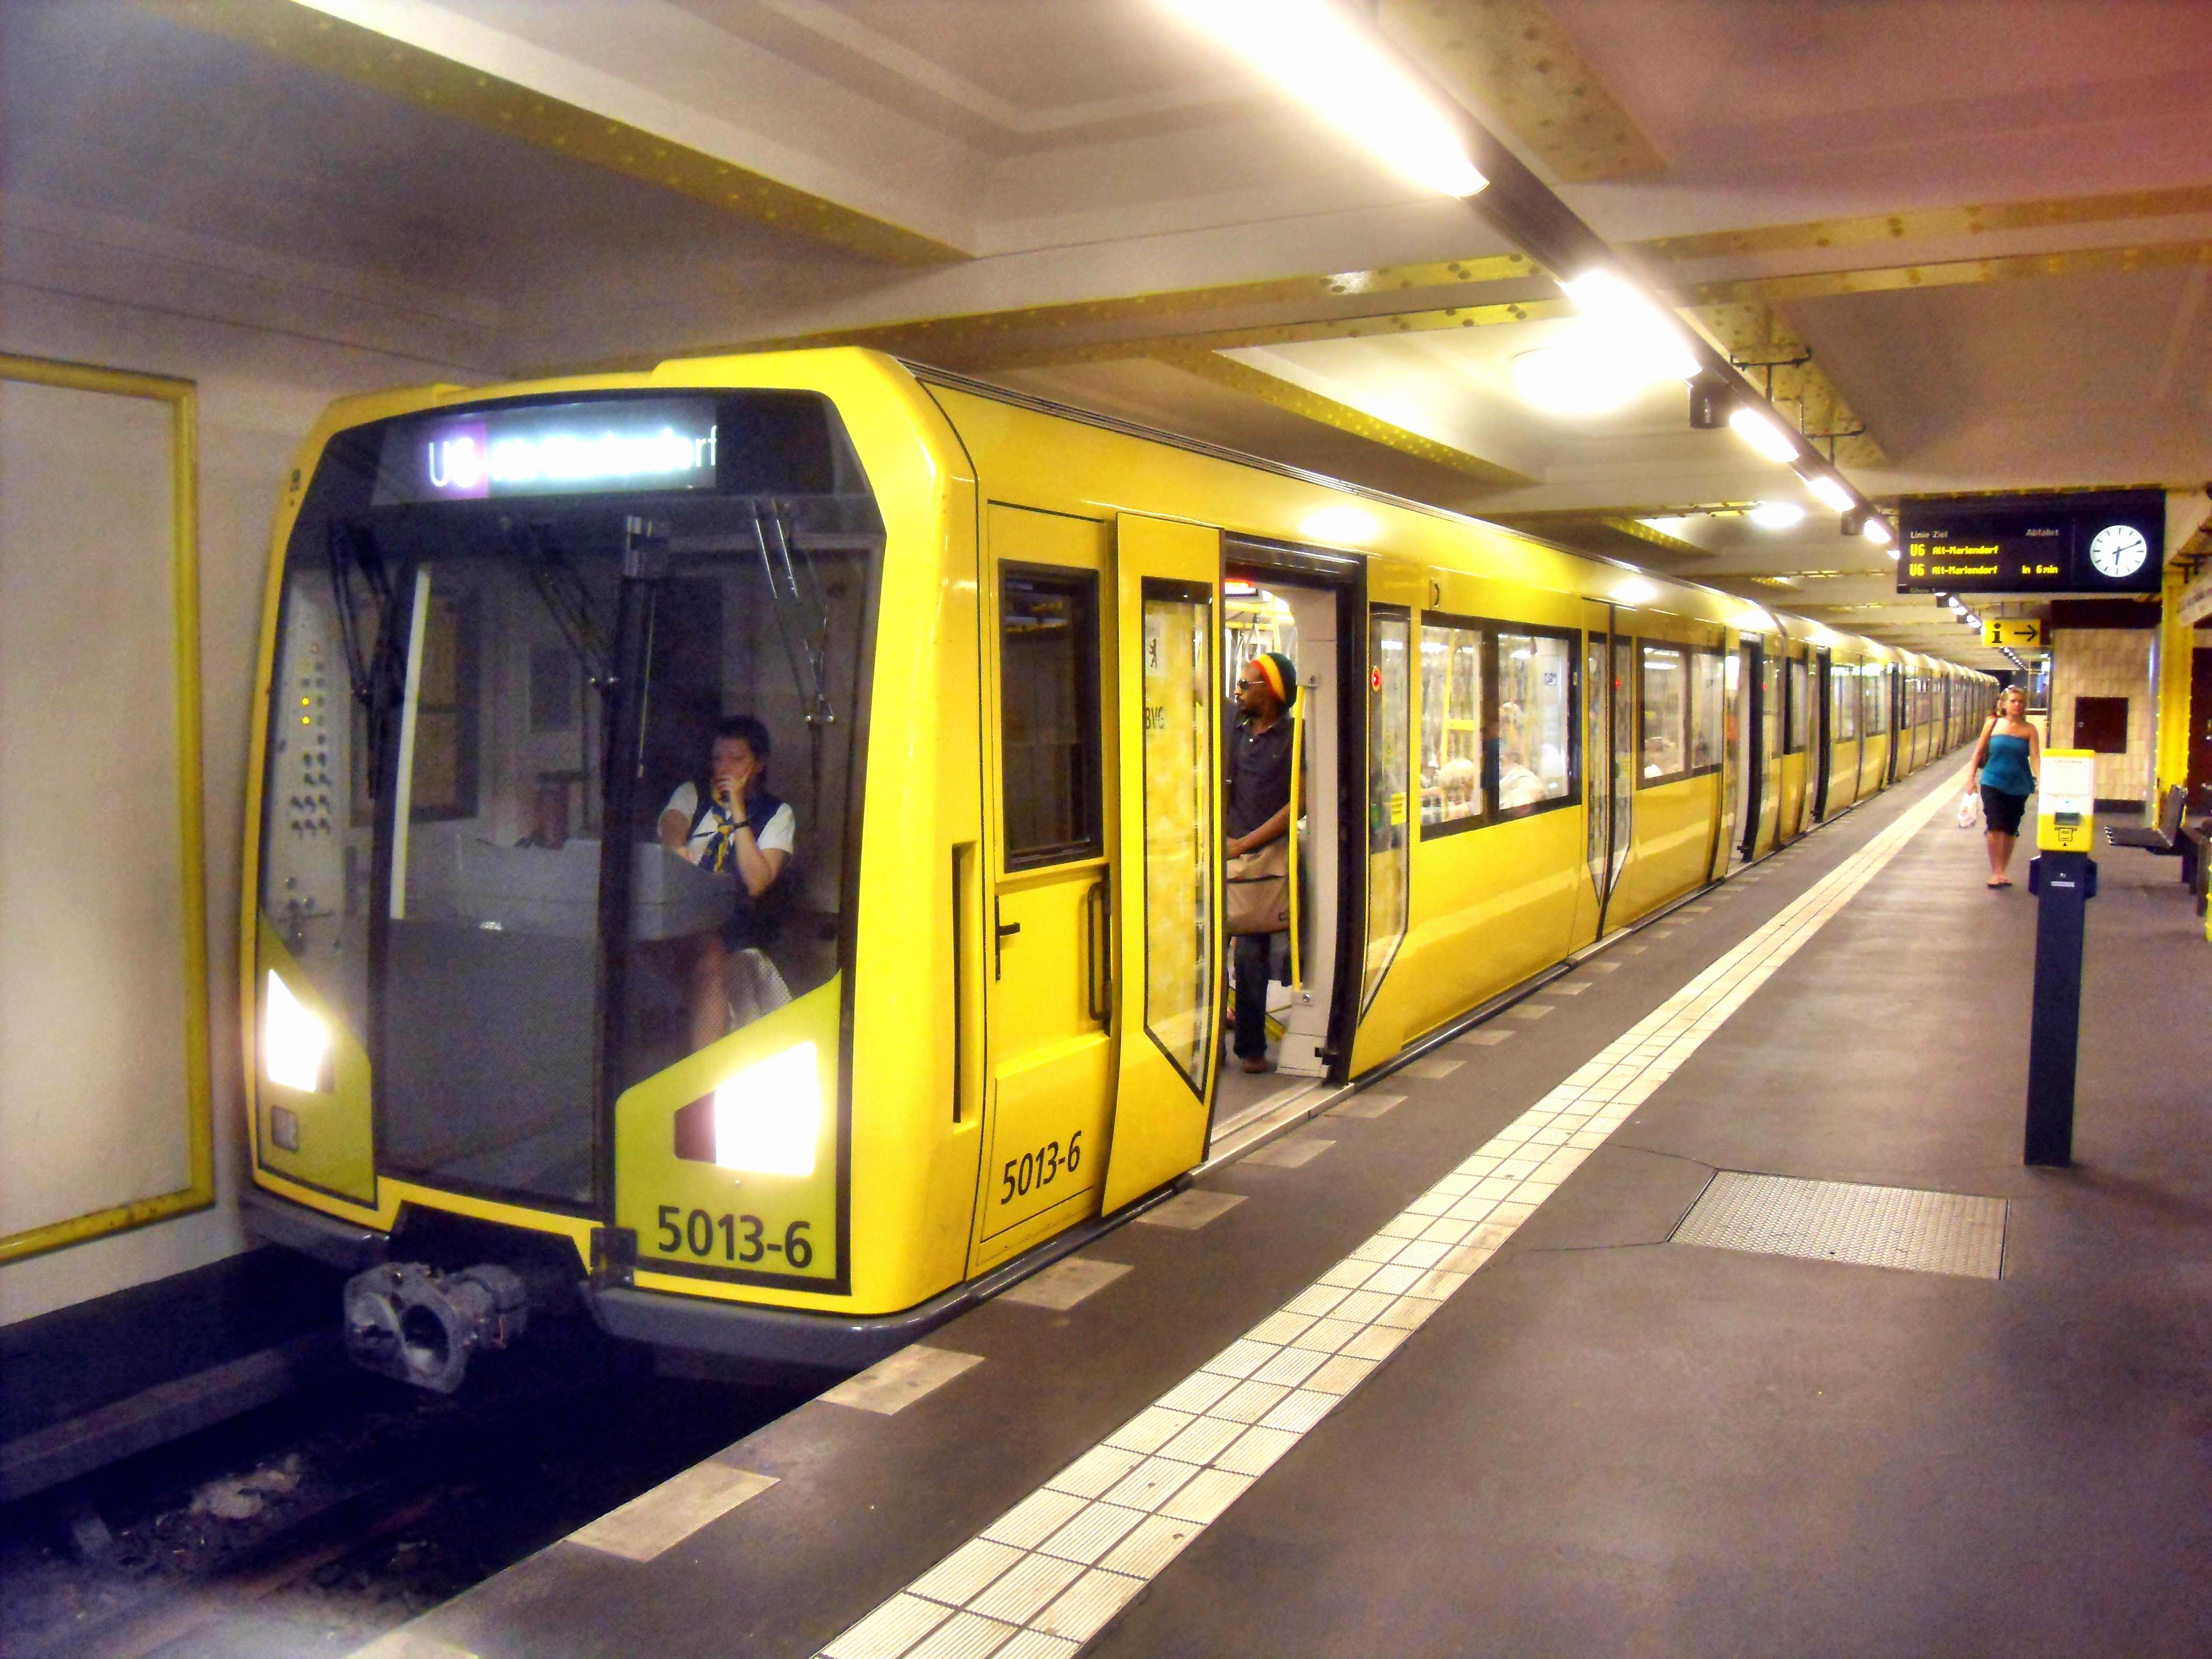 https://upload.wikimedia.org/wikipedia/commons/9/9c/Berlin-_U-Bahn-Station_Kochstra%C3%9Fe-_auf_Bahnsteig_zu_Gleis_1-_Richtung_Berlin-Alt-Tegel-_U-Bahn_BVG-Baureihe_H_5013-6_8.8.2009.jpg